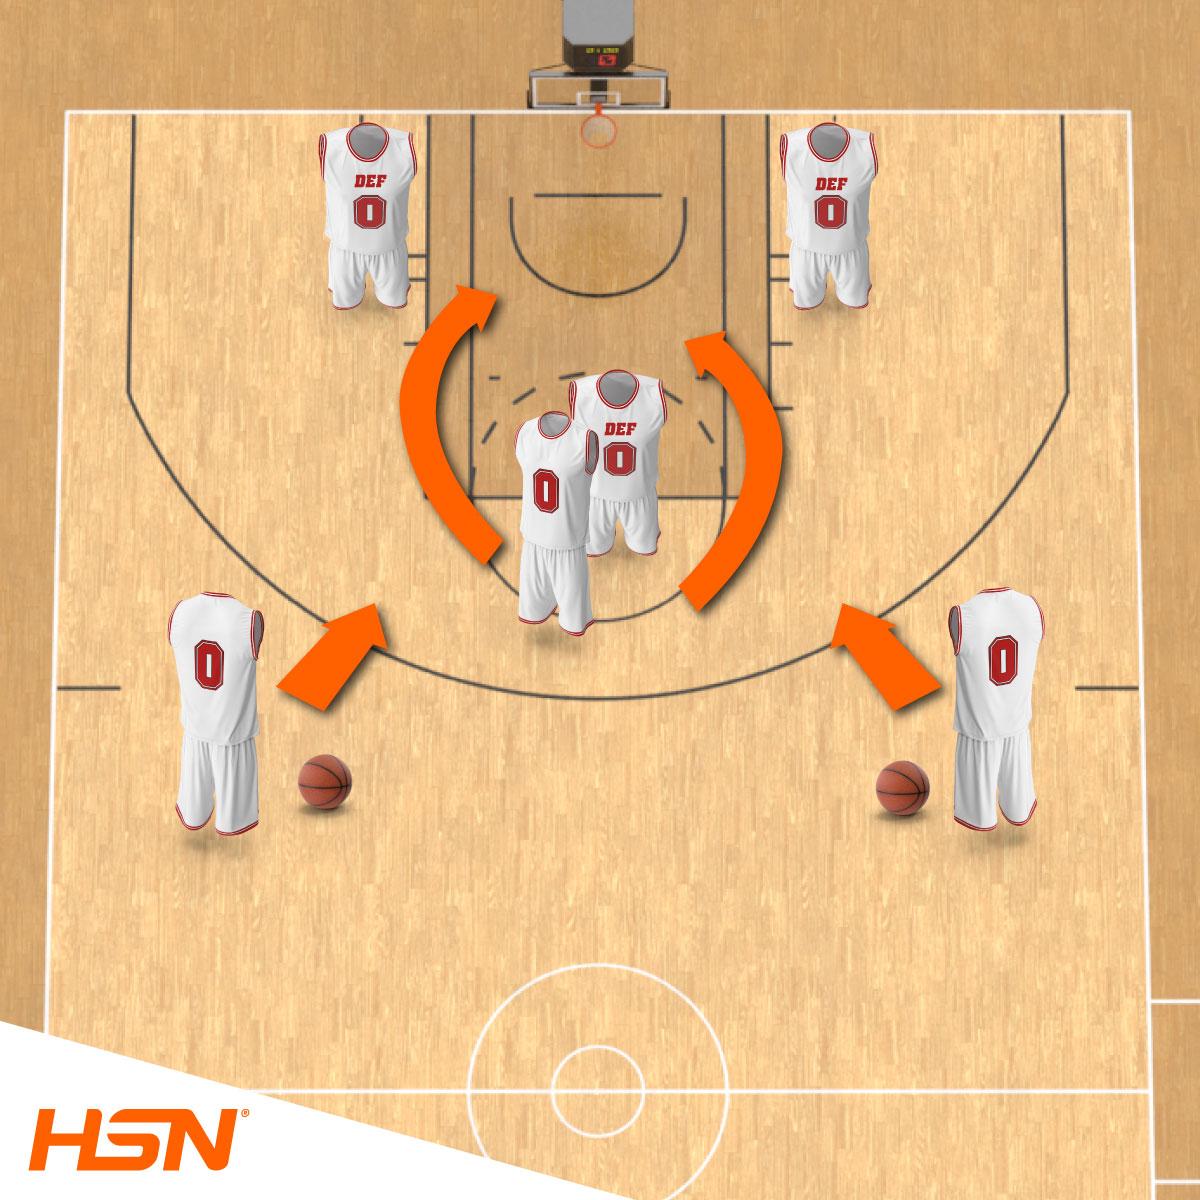 Functional training basketball